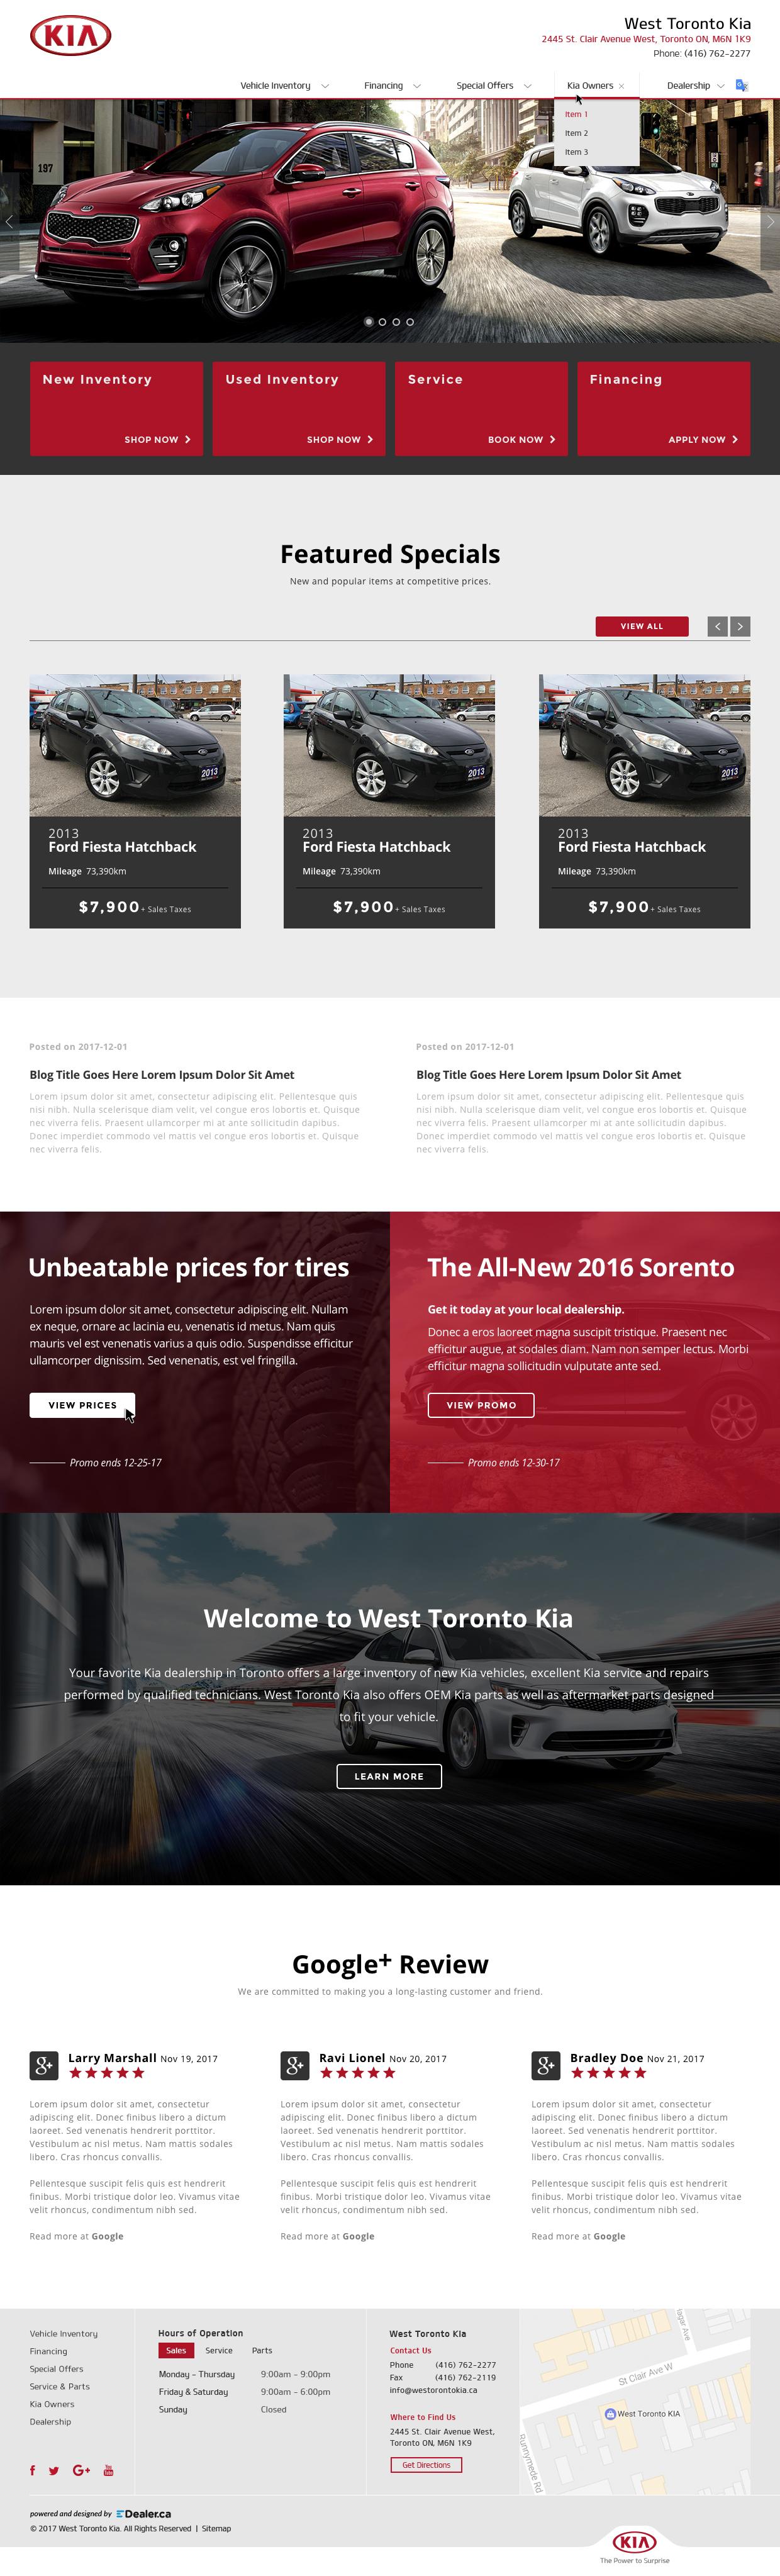 West Toronto Kia-1240px